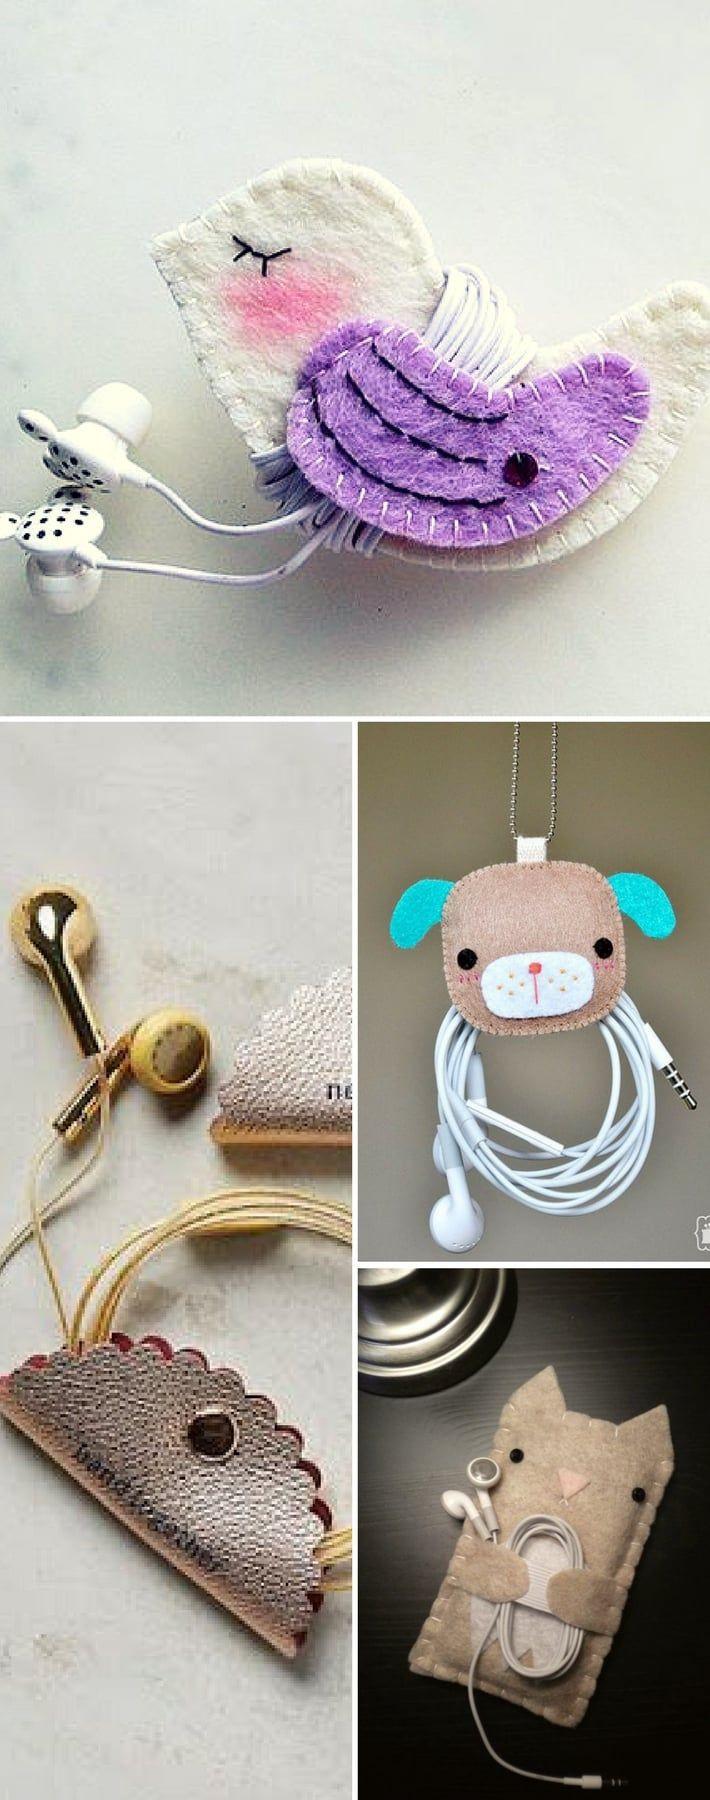 Diy Gift Ideas For Girlfriend  Best 25 Diy ts for girlfriend ideas on Pinterest